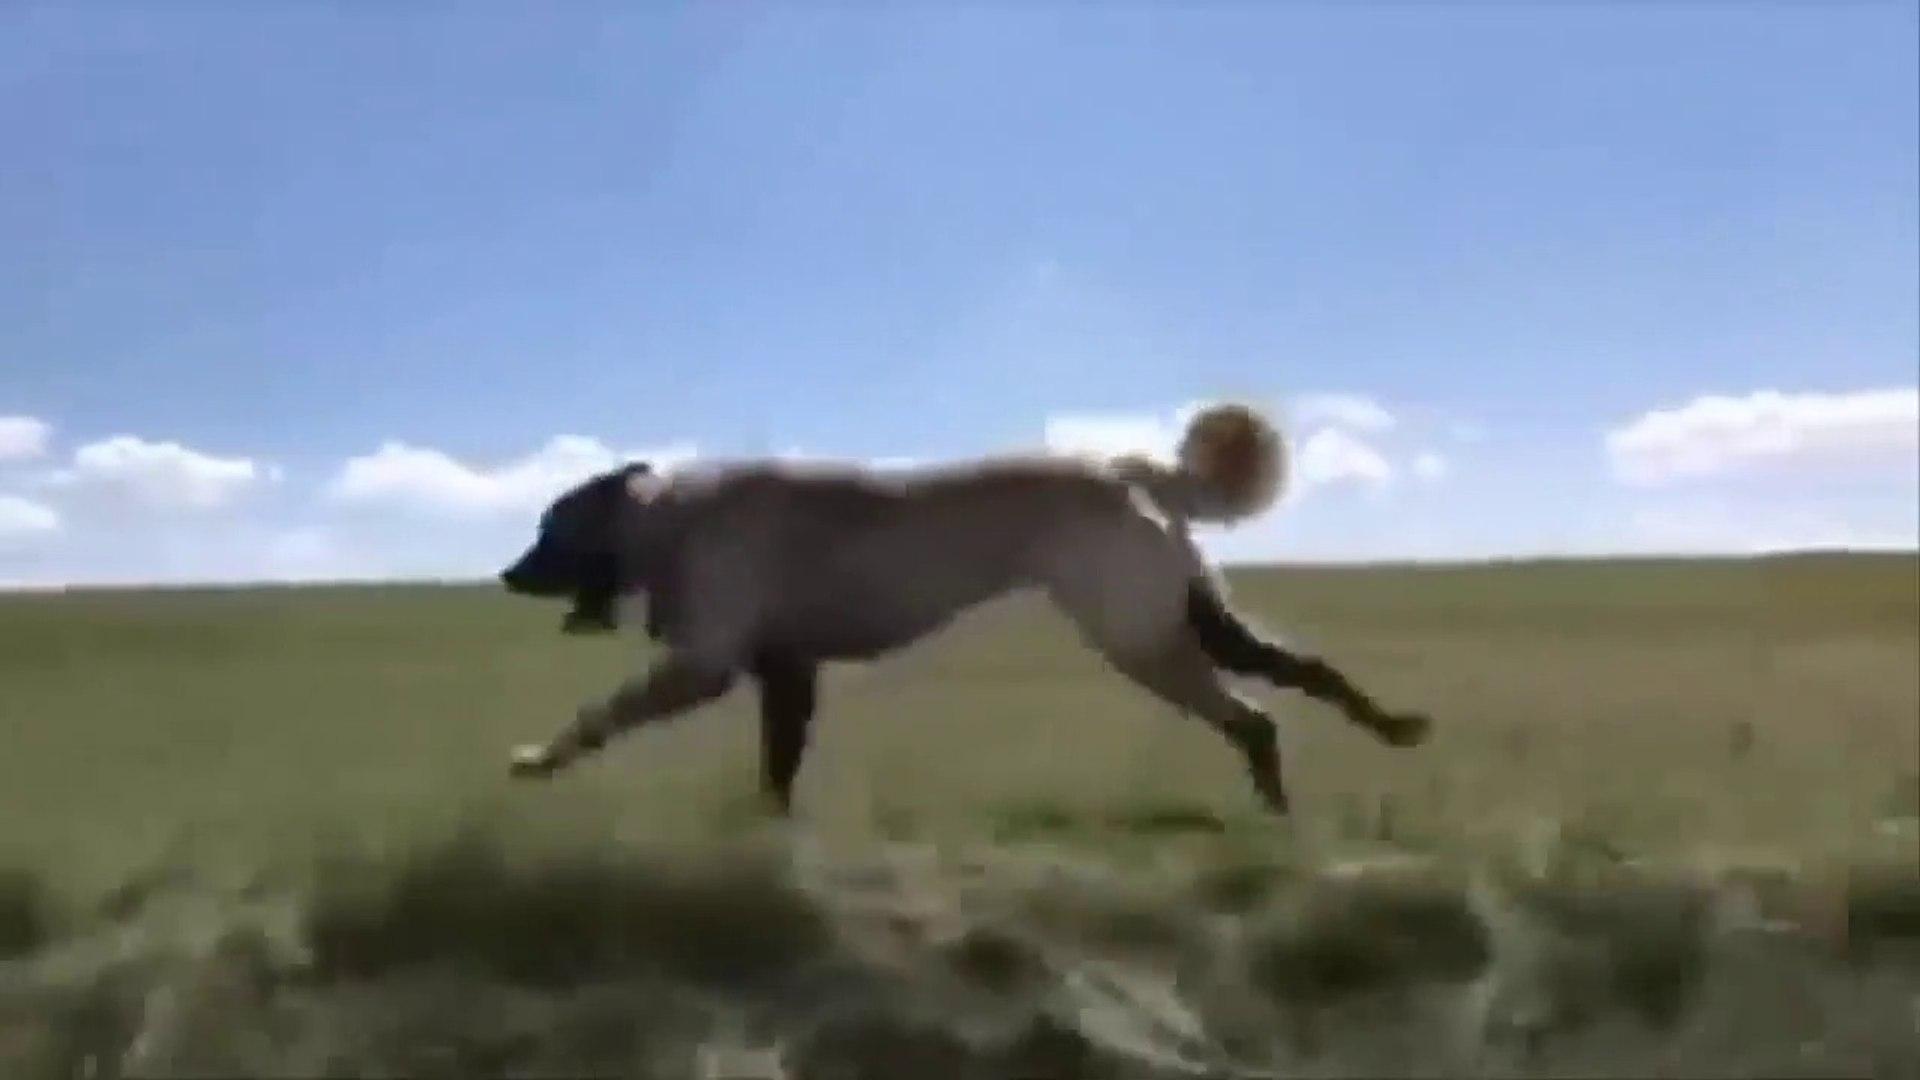 KANGAL KOPEGi DAG BAYIR GEZE GEZE KOSUYOR - KANGAL SHEPHERD DOG RUNNiNG